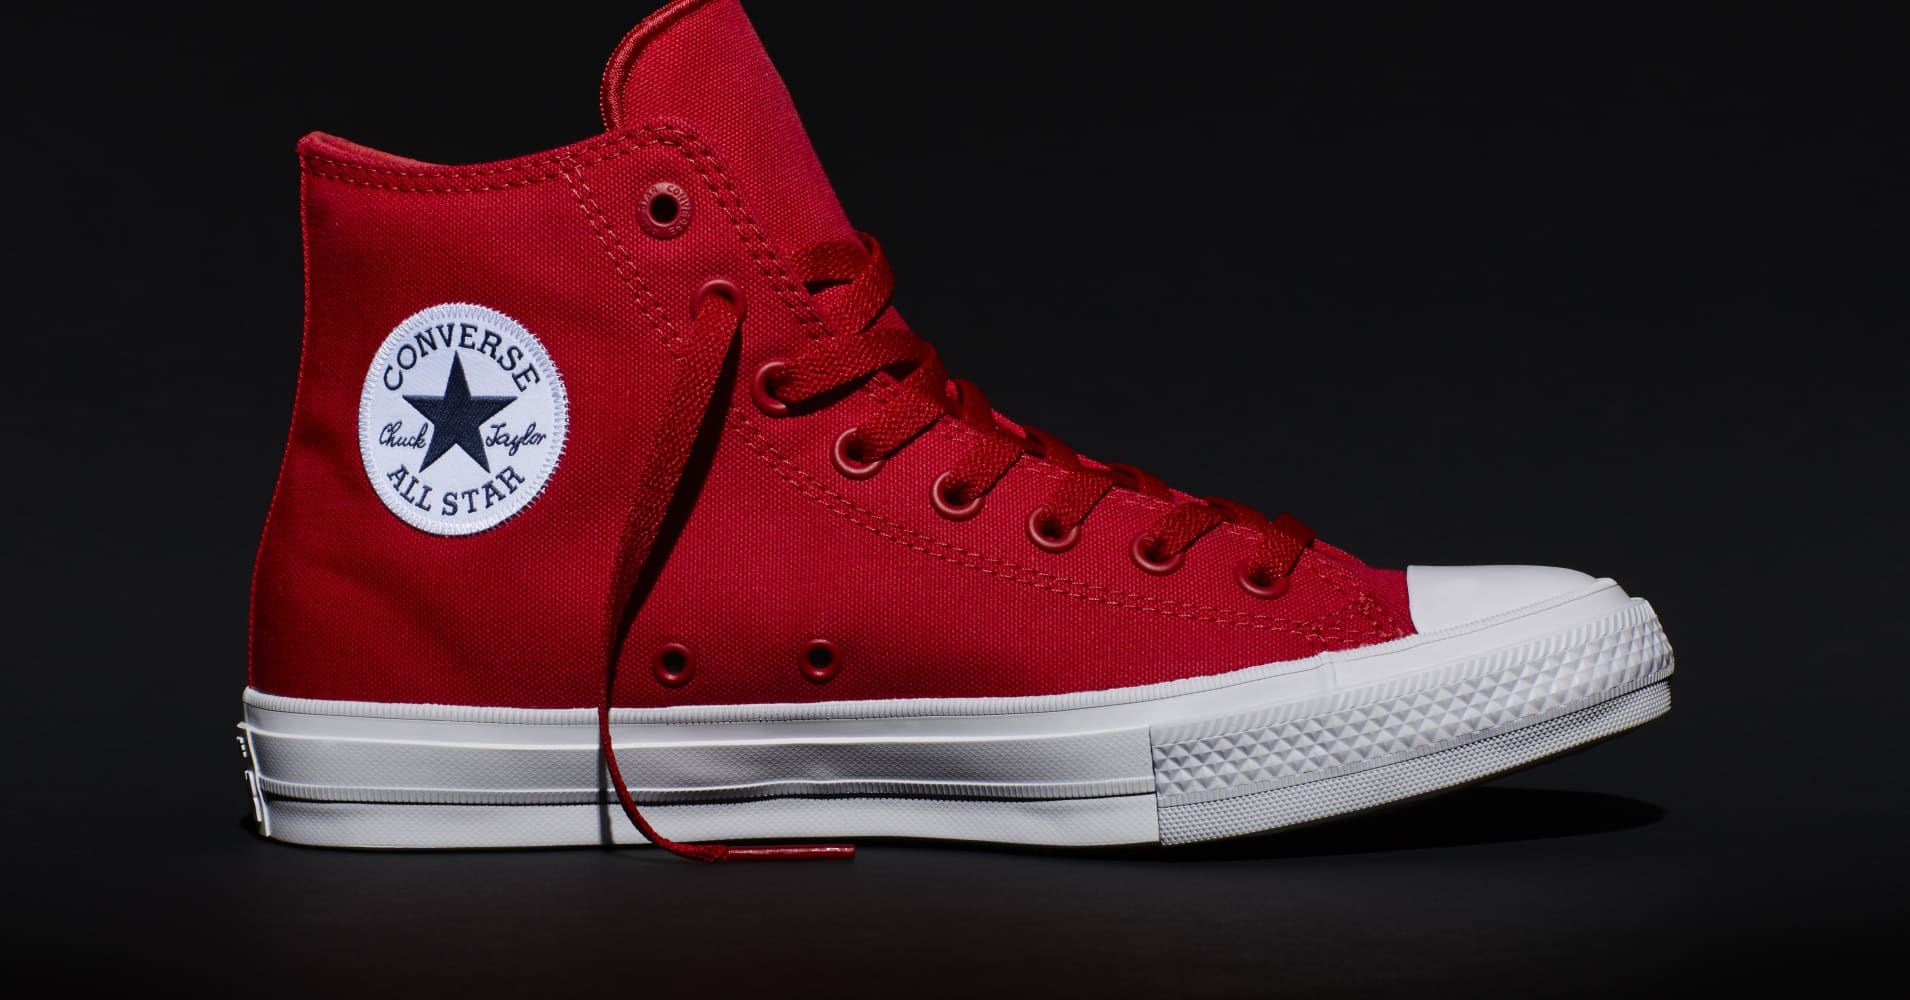 e855e1f32fa Converse makes first change in a century to the Chuck Taylor All Star  sneaker